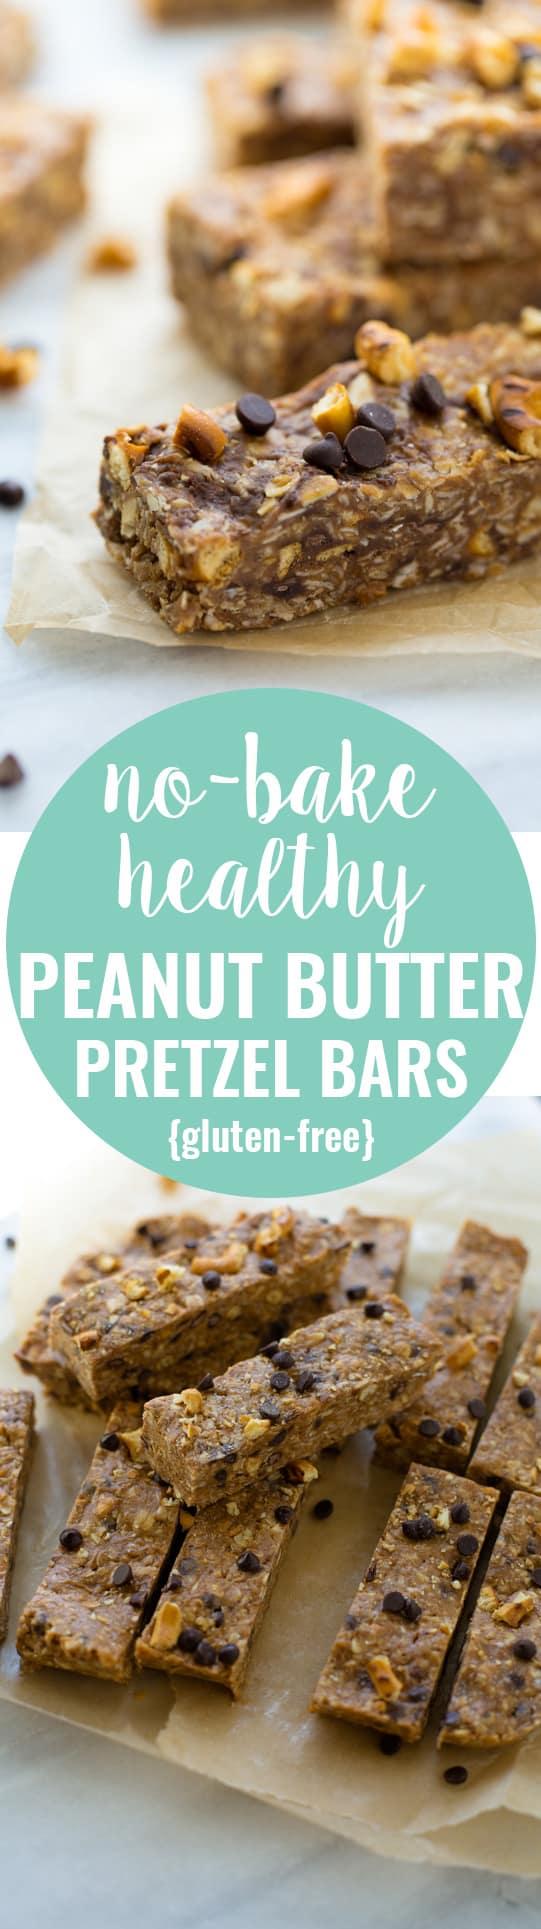 No-Bake, Healthy Peanut Butter Pretzel Bars! Honey-sweetened and so easy to make. (Gluten-Free)